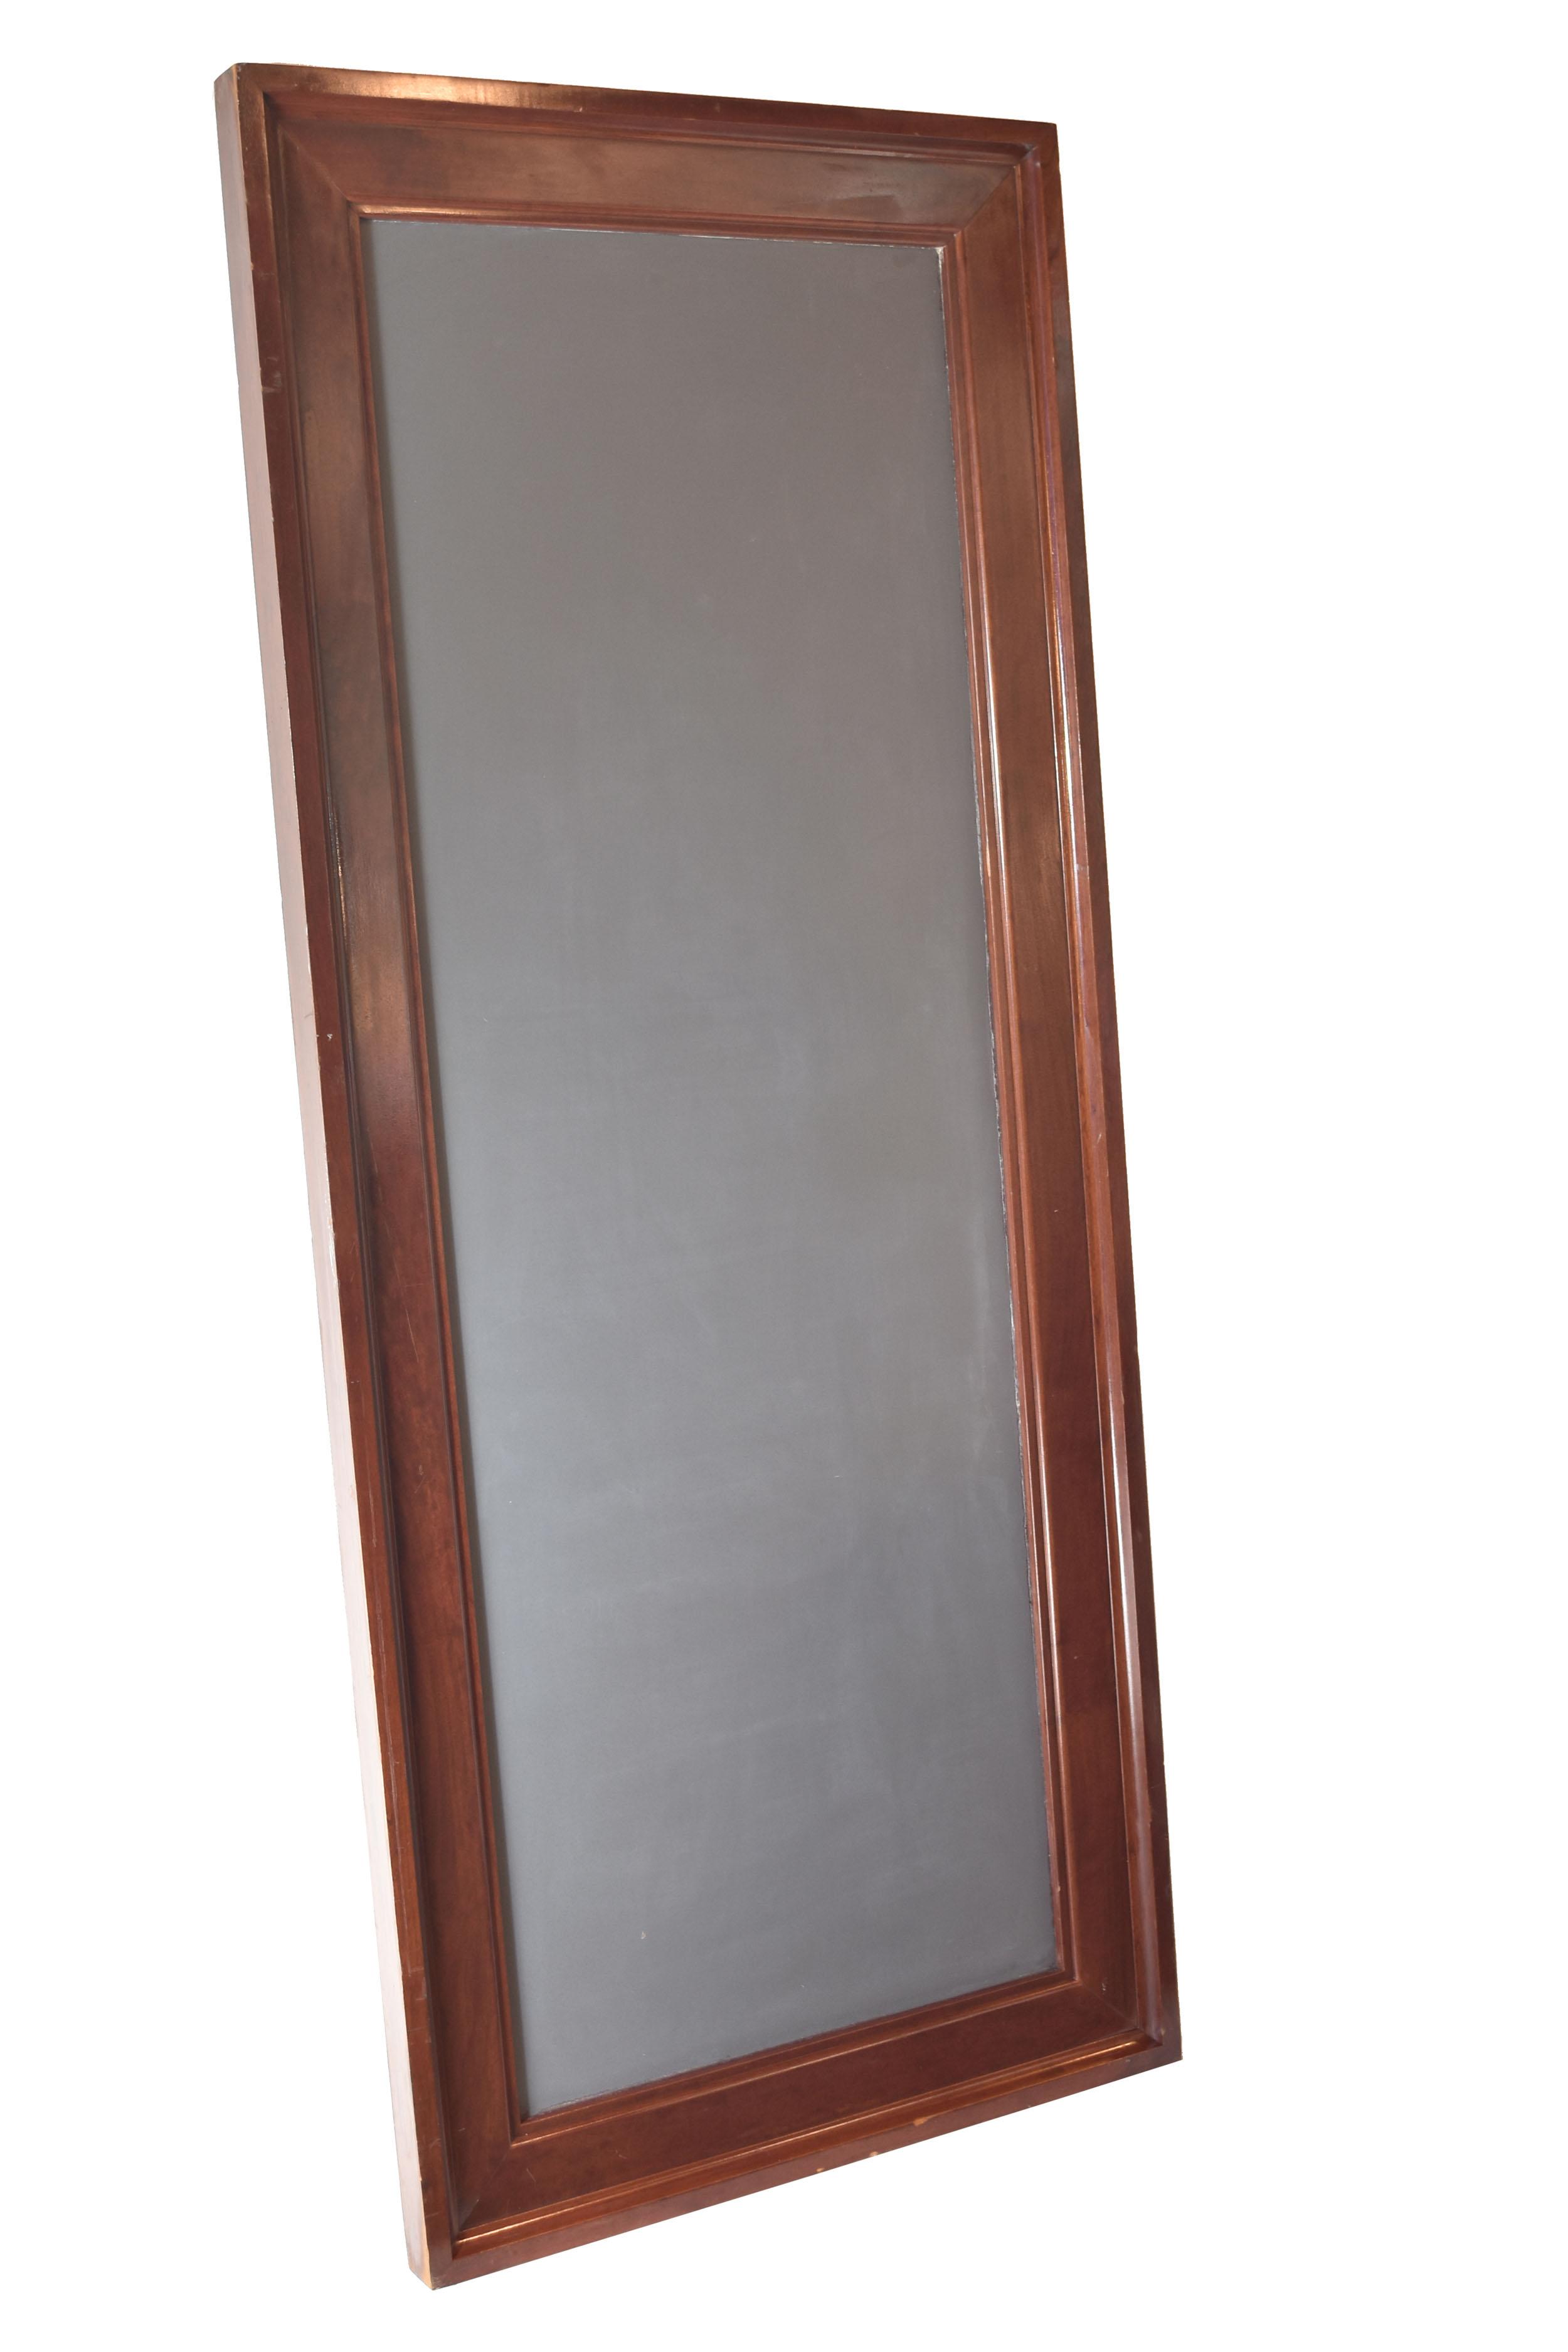 48048 rectangle chalkboard 2.jpg